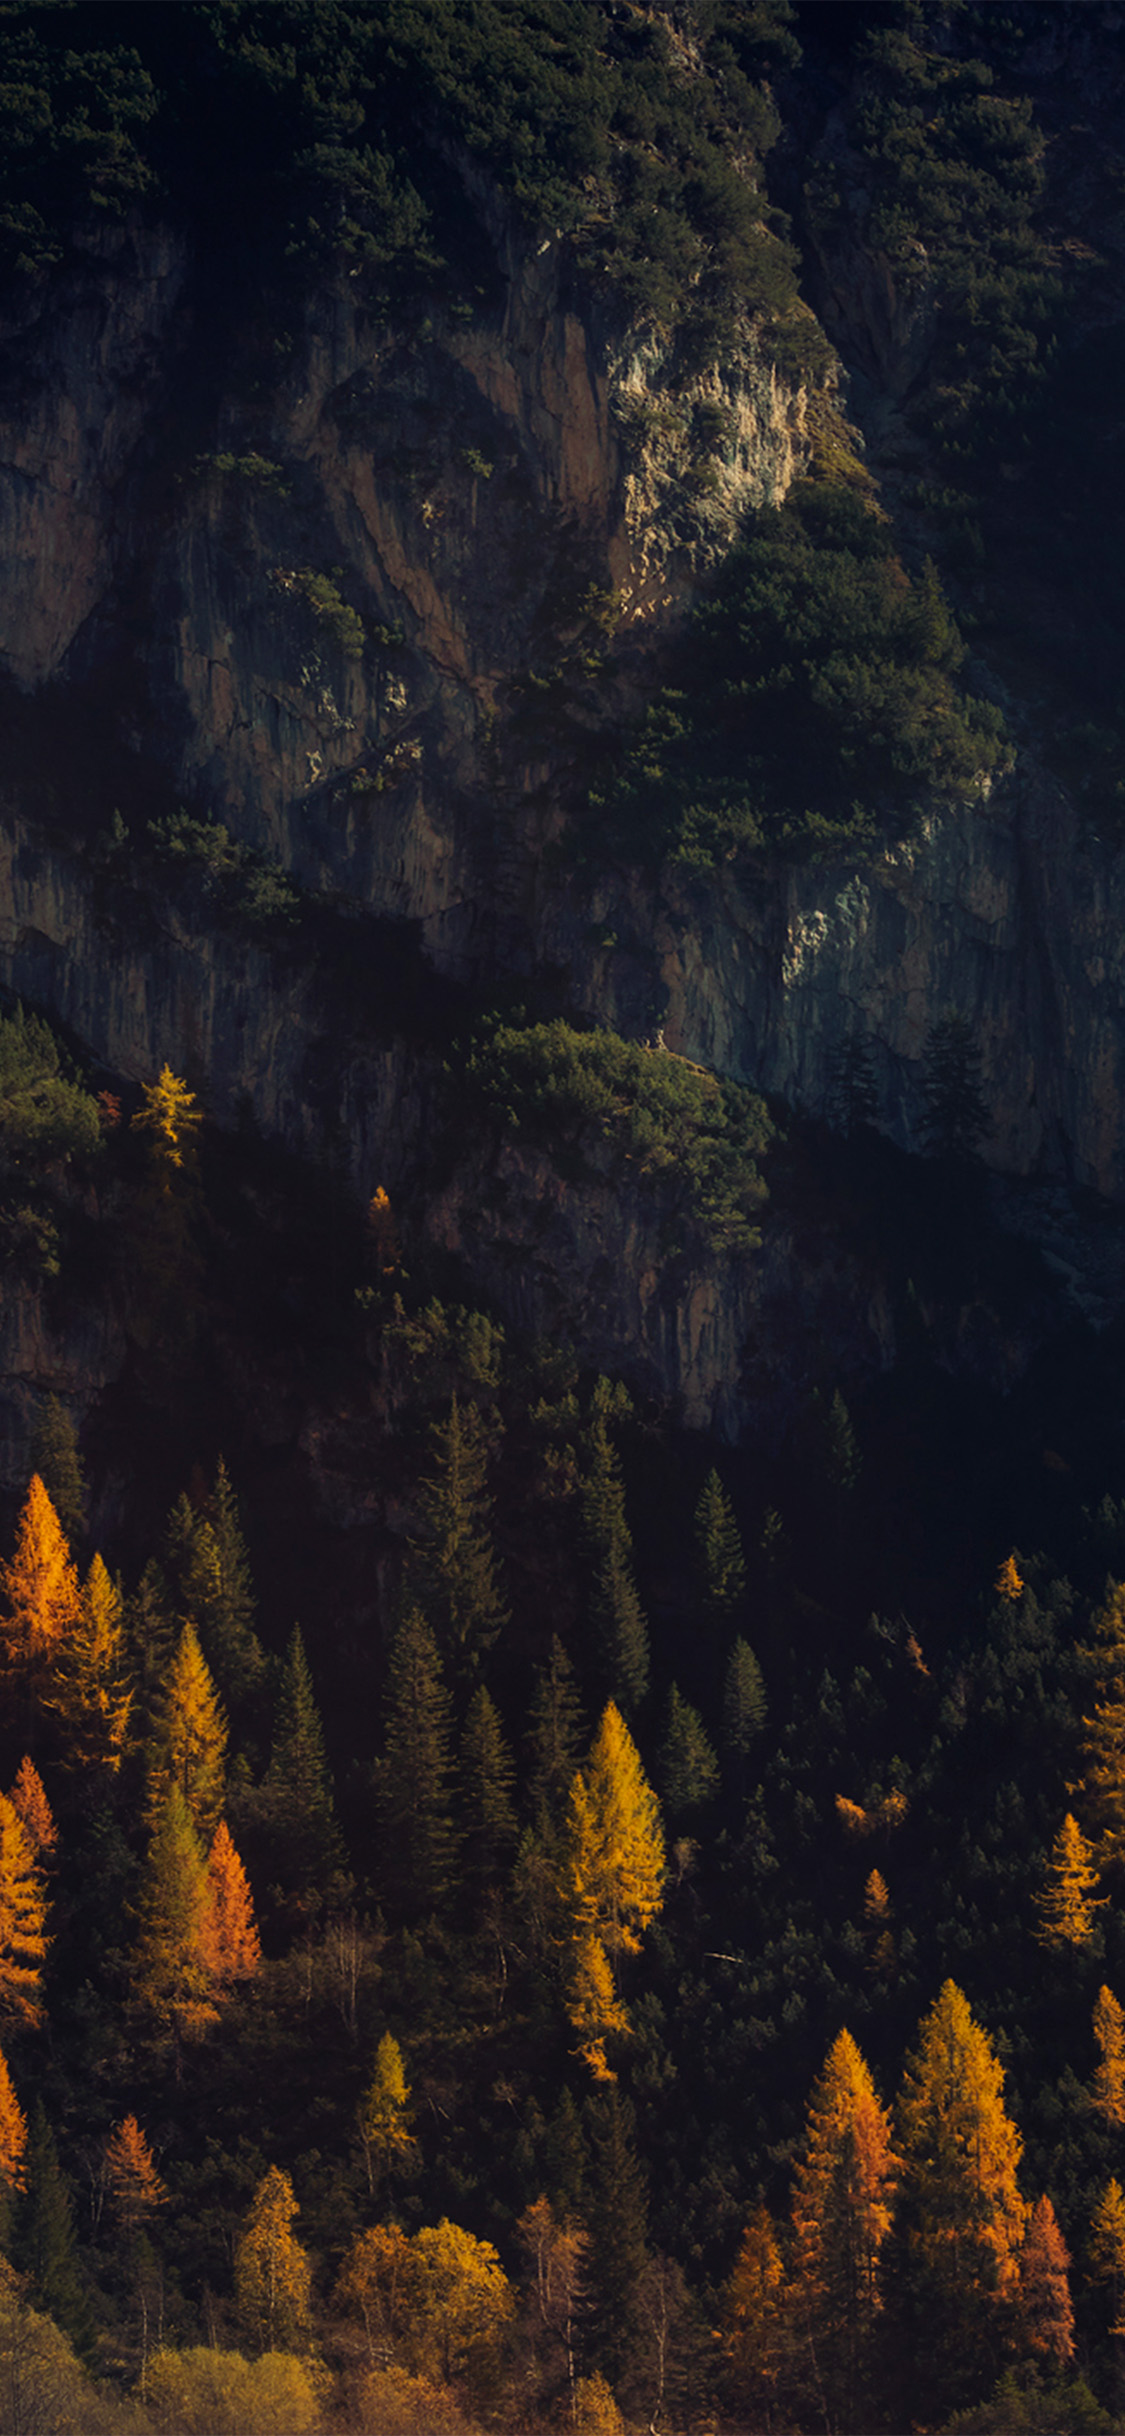 Iphonexpapers Com Iphone X Wallpaper Nz49 Wood Tree Fall Mountain Nature